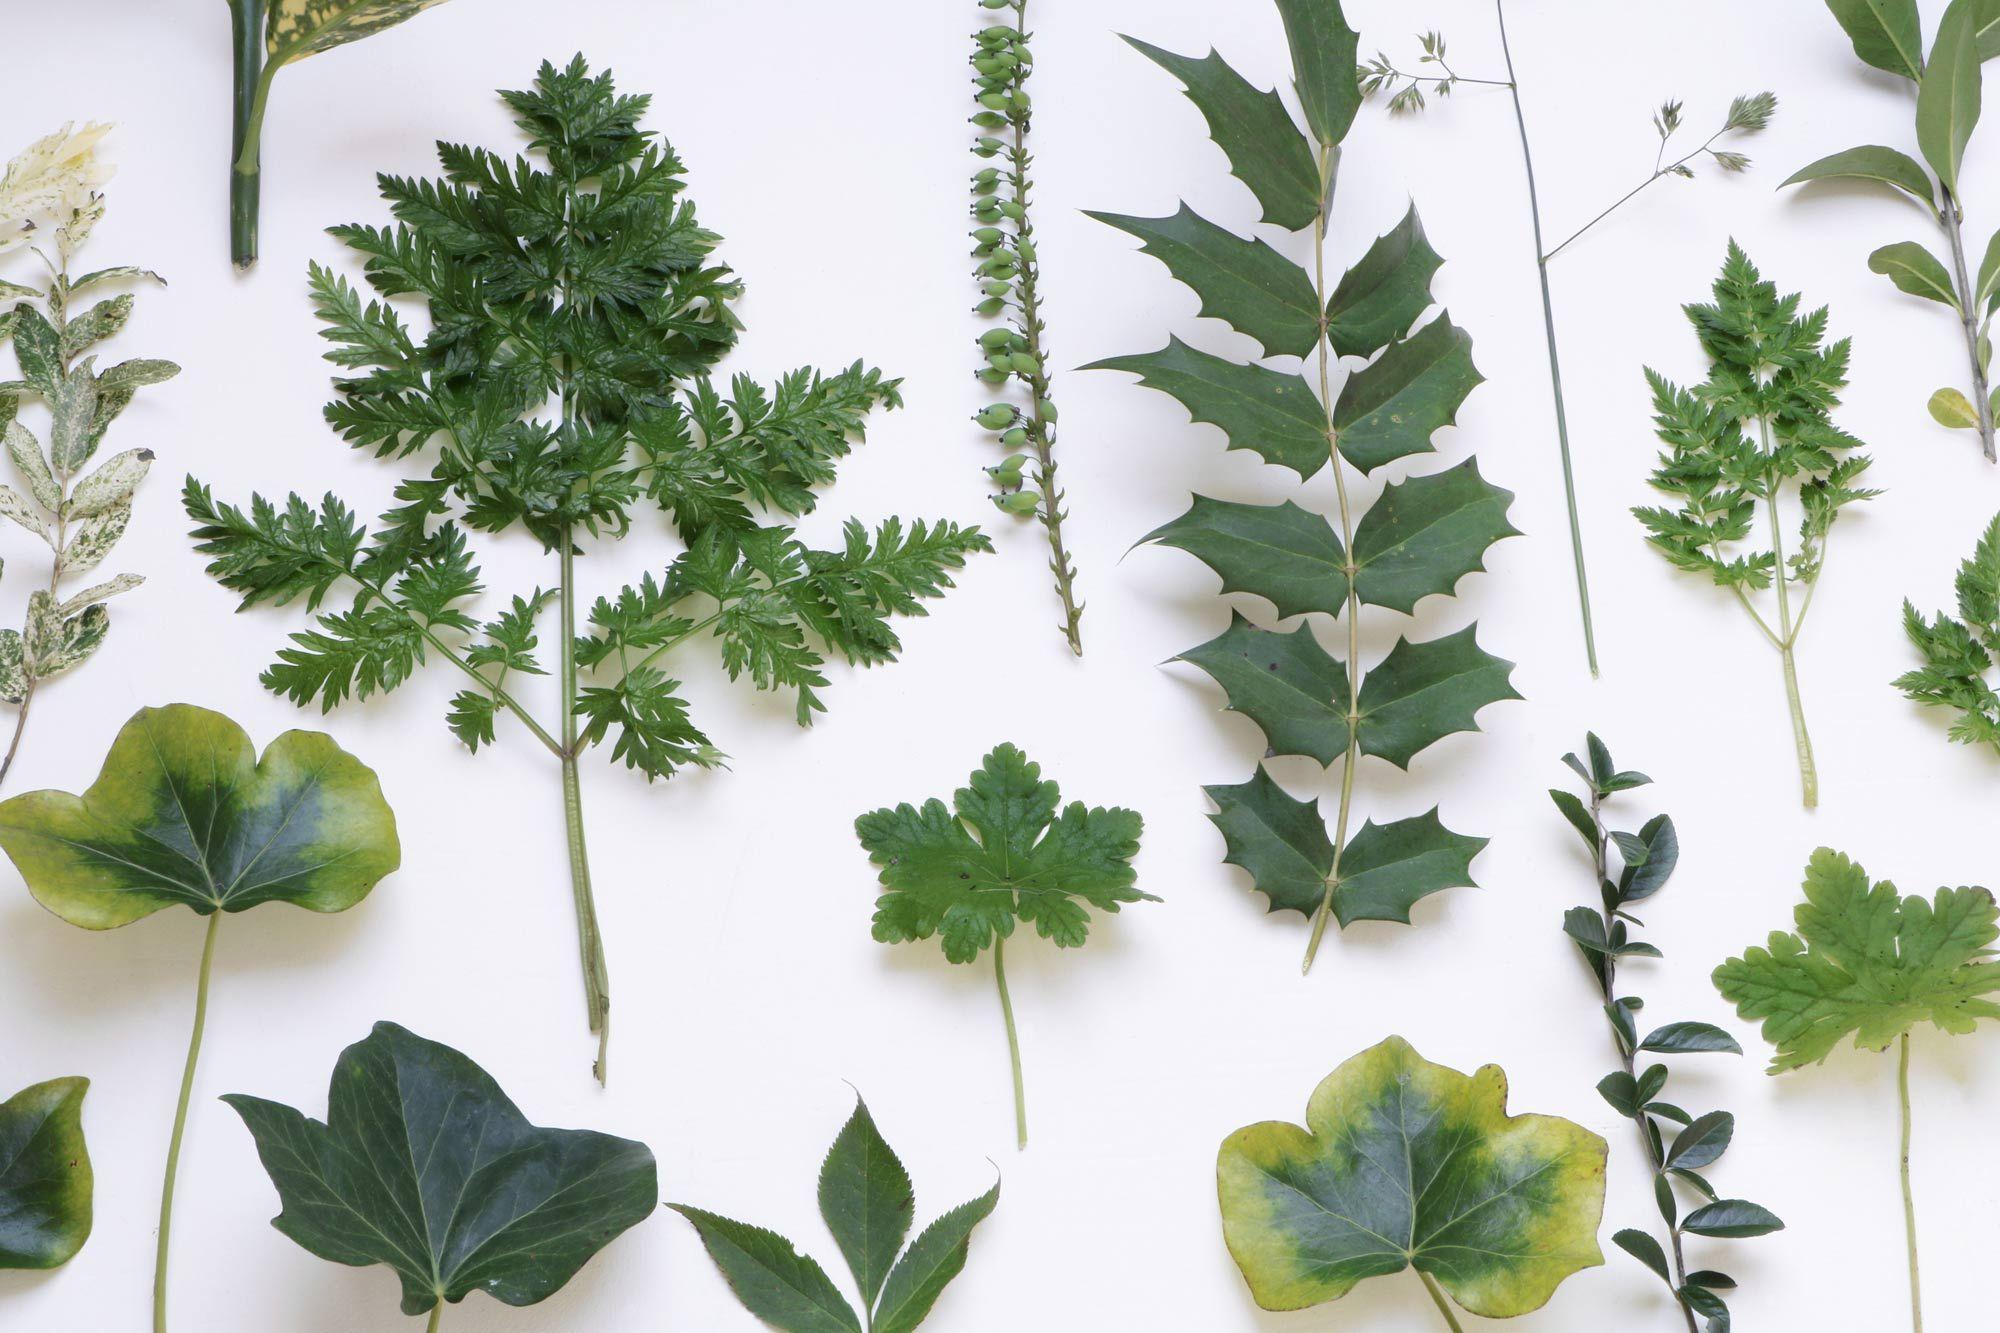 botanische wanddecoratie fotografie amp styling marij